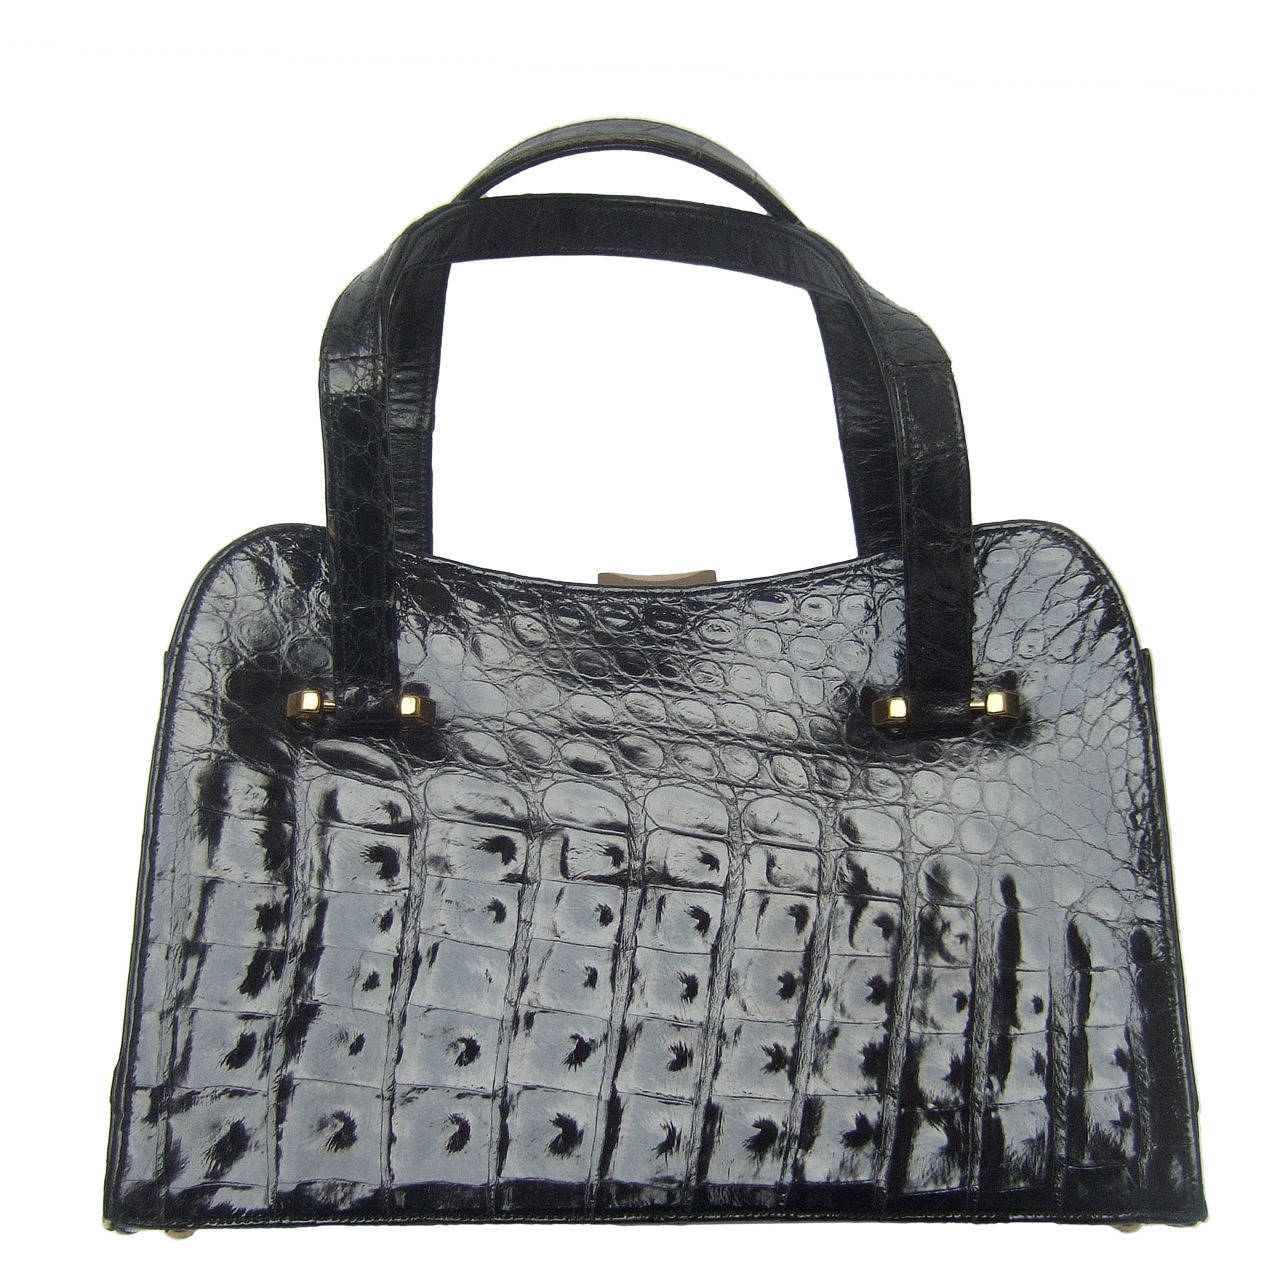 Exotic Sleek Black Alligator Handbag c 1960 1